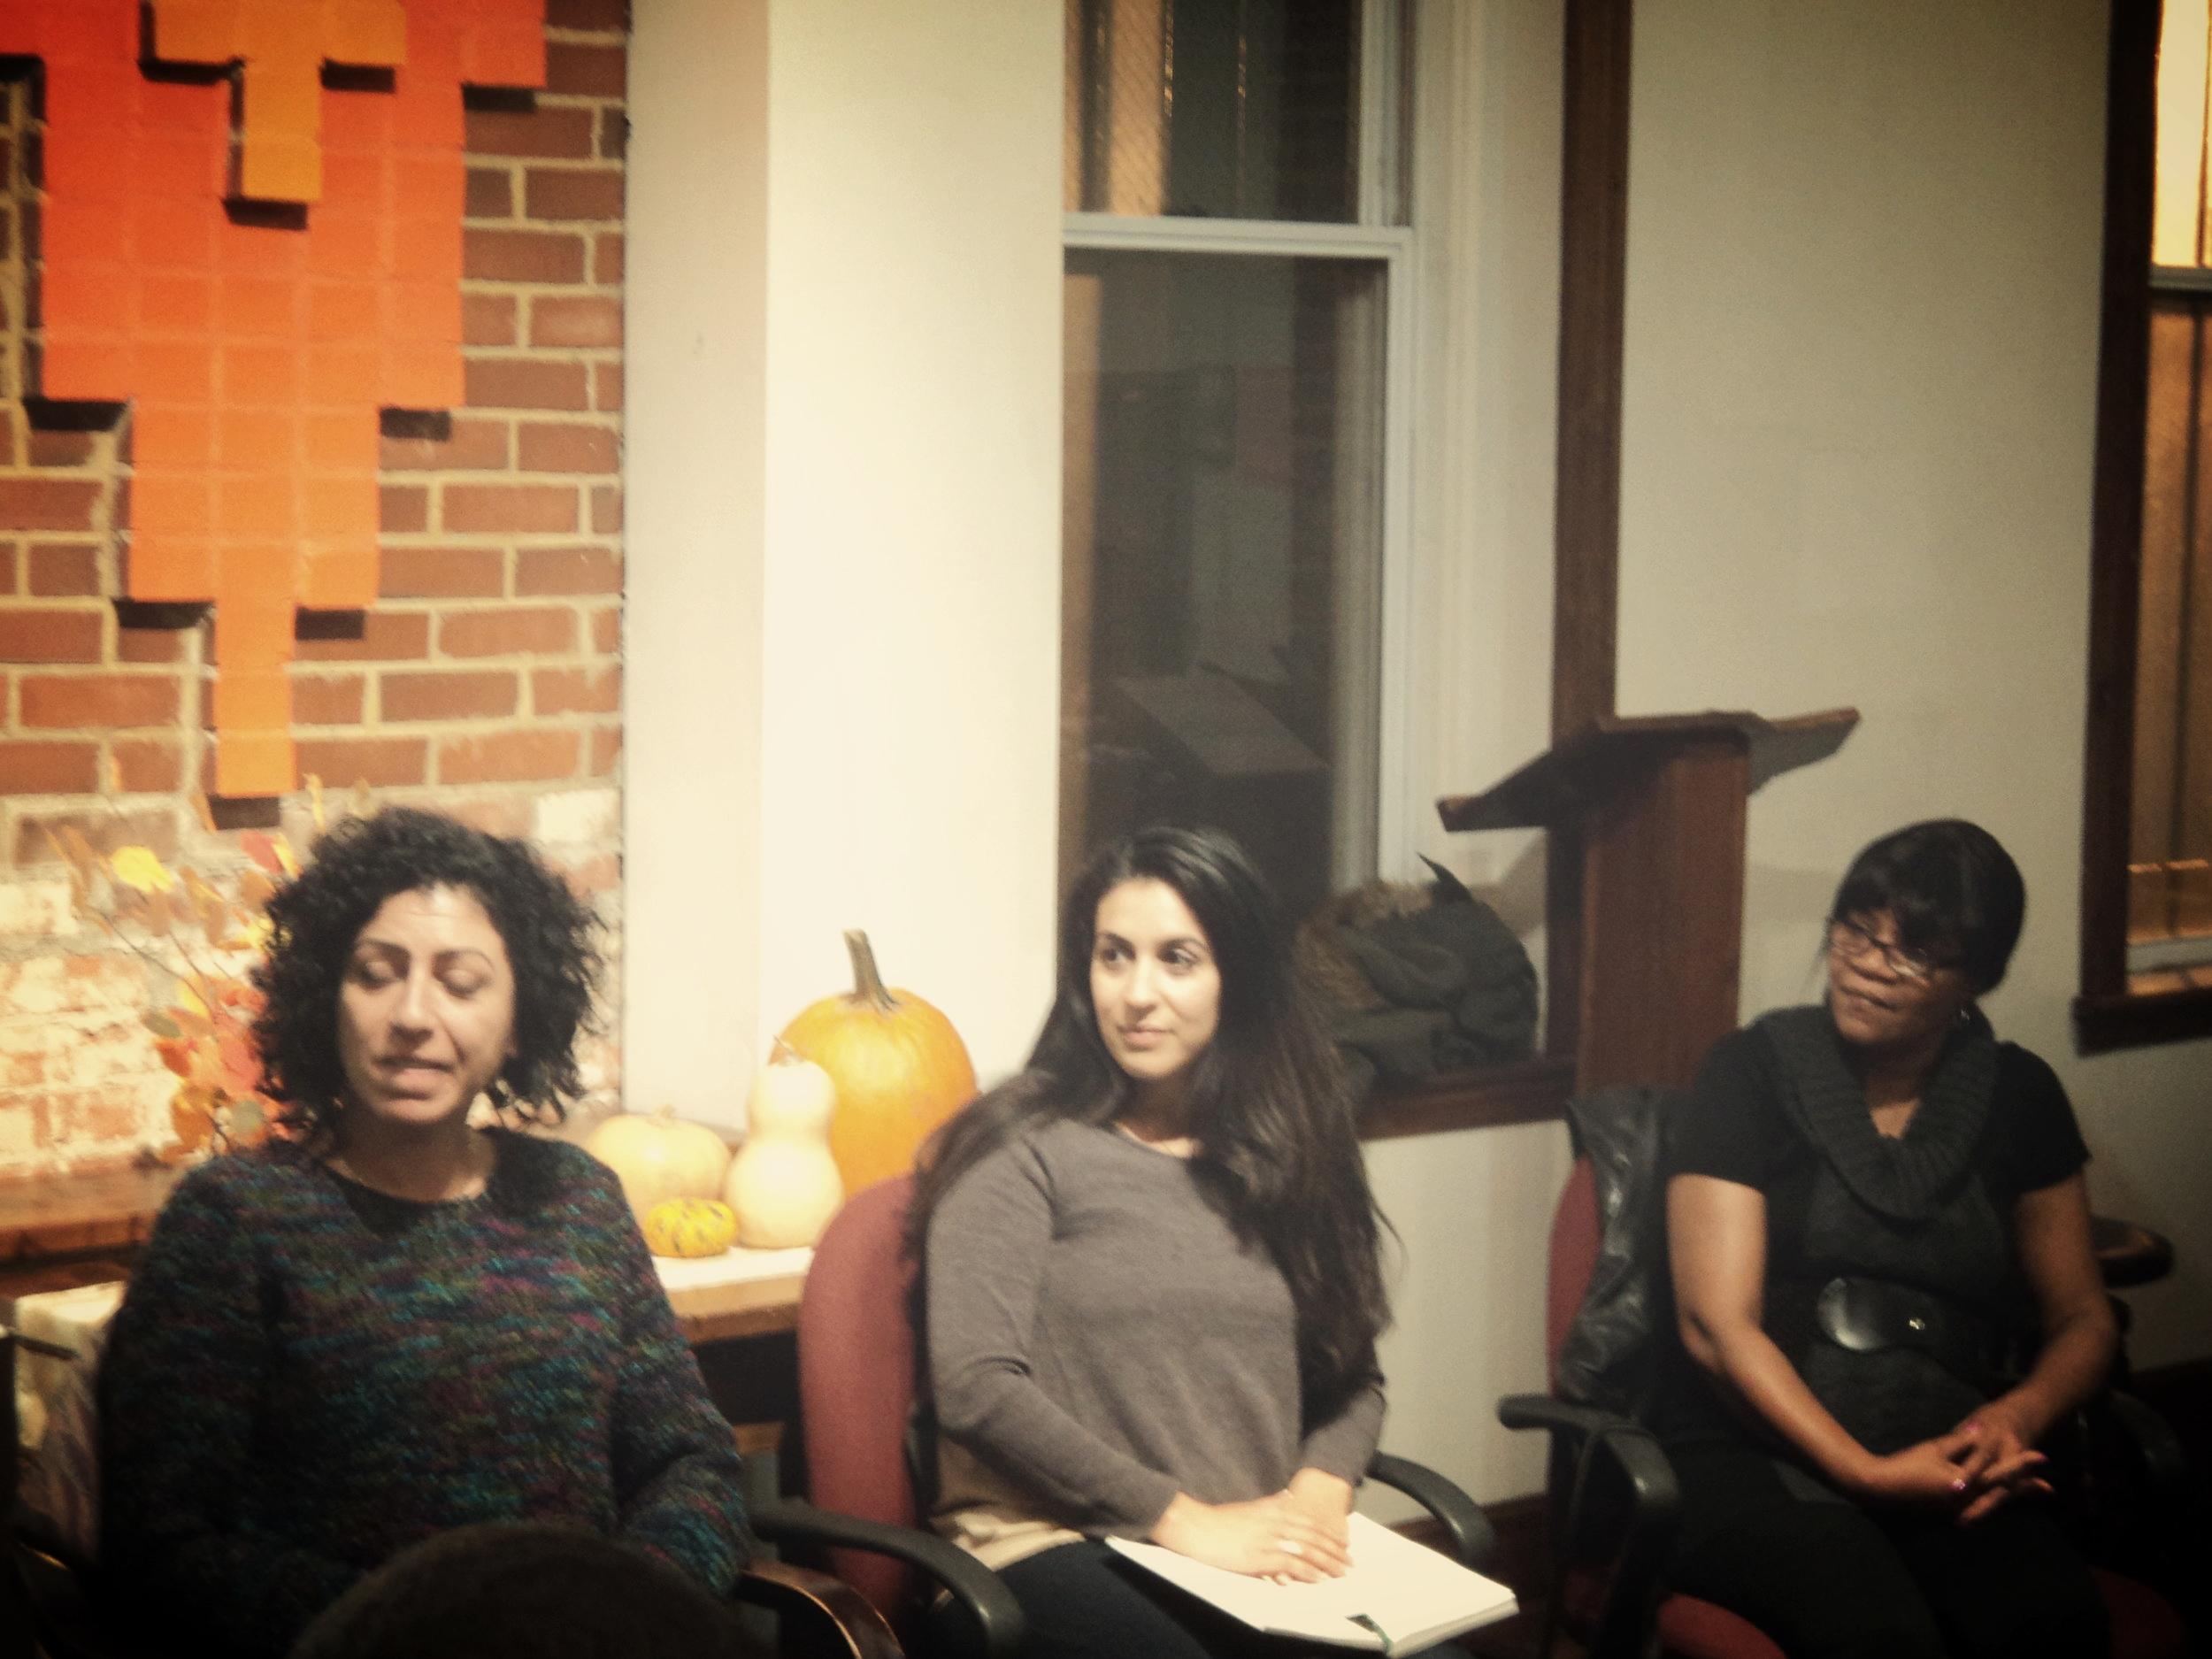 Pictured (left to right): Fayrouz Sharqawi, Advocacy Coordinator at the organization Grassroots Jerusalem; Yasmina Mrabet, DC Housing Organizer: Cheryl Brunson, Tenant Leader at Brookland Manor. Photo source: ONE DC